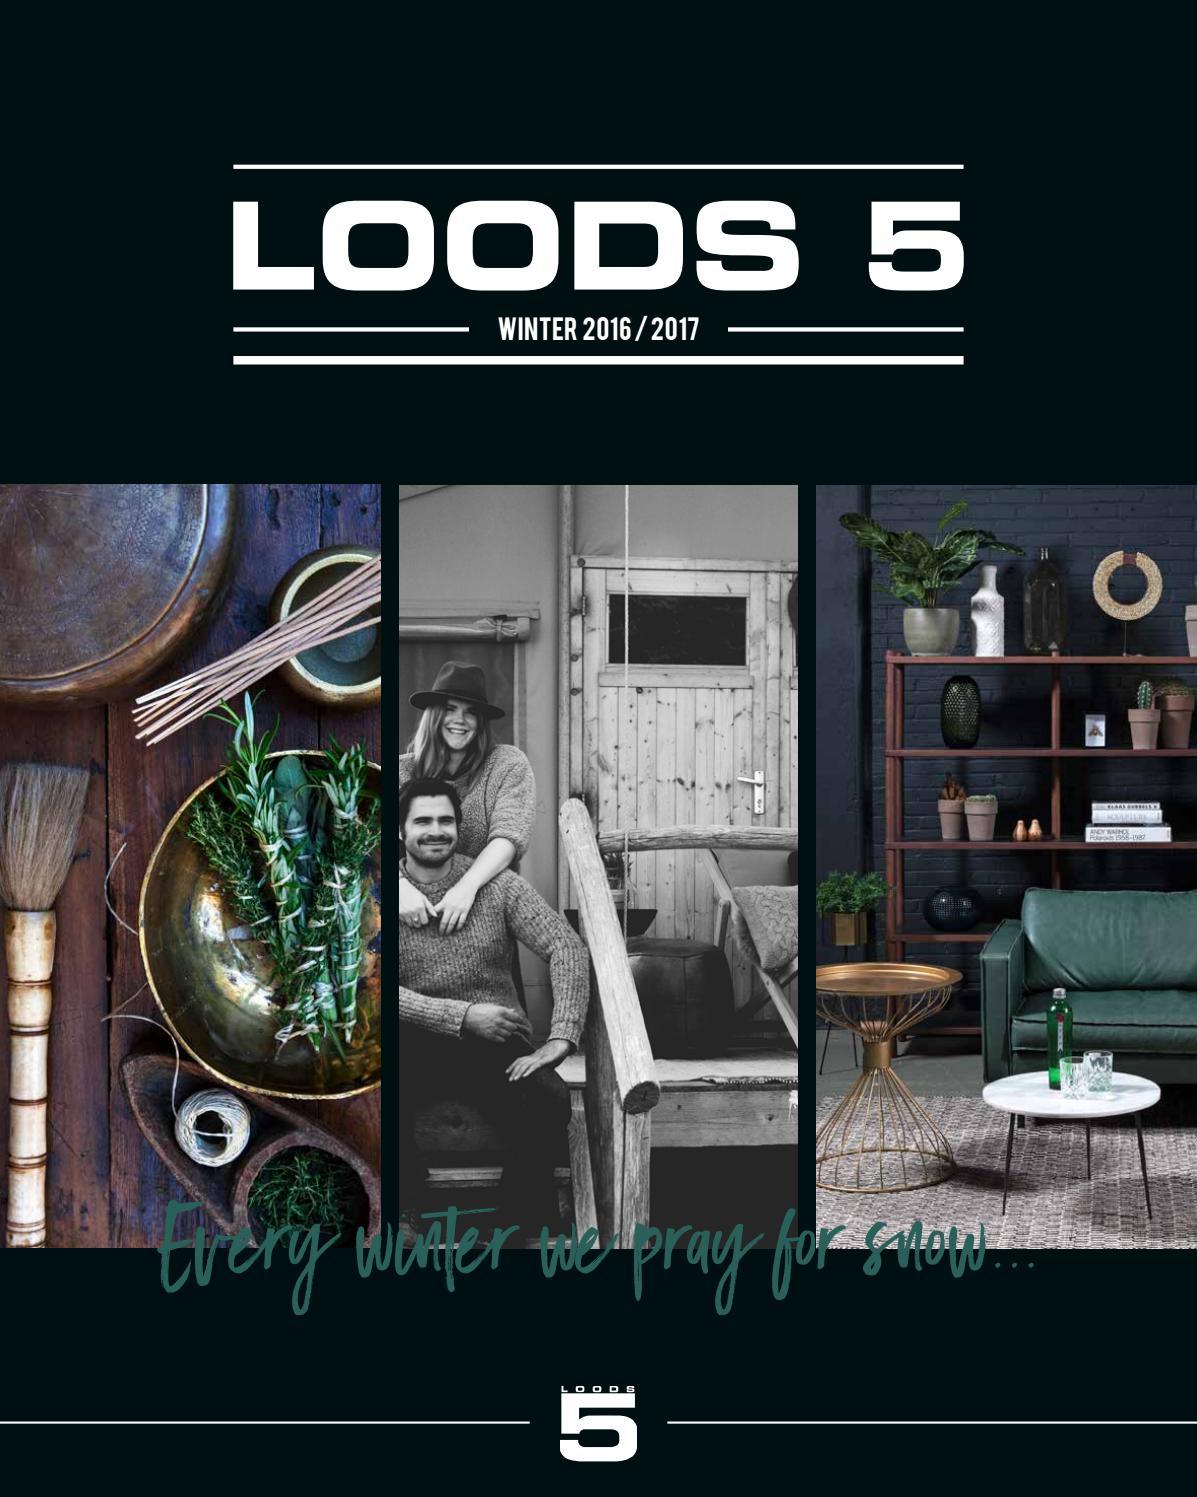 Goede Loods 5 magazine winter 2016/2017 by Ontwerpstudio 5 - issuu BV-49